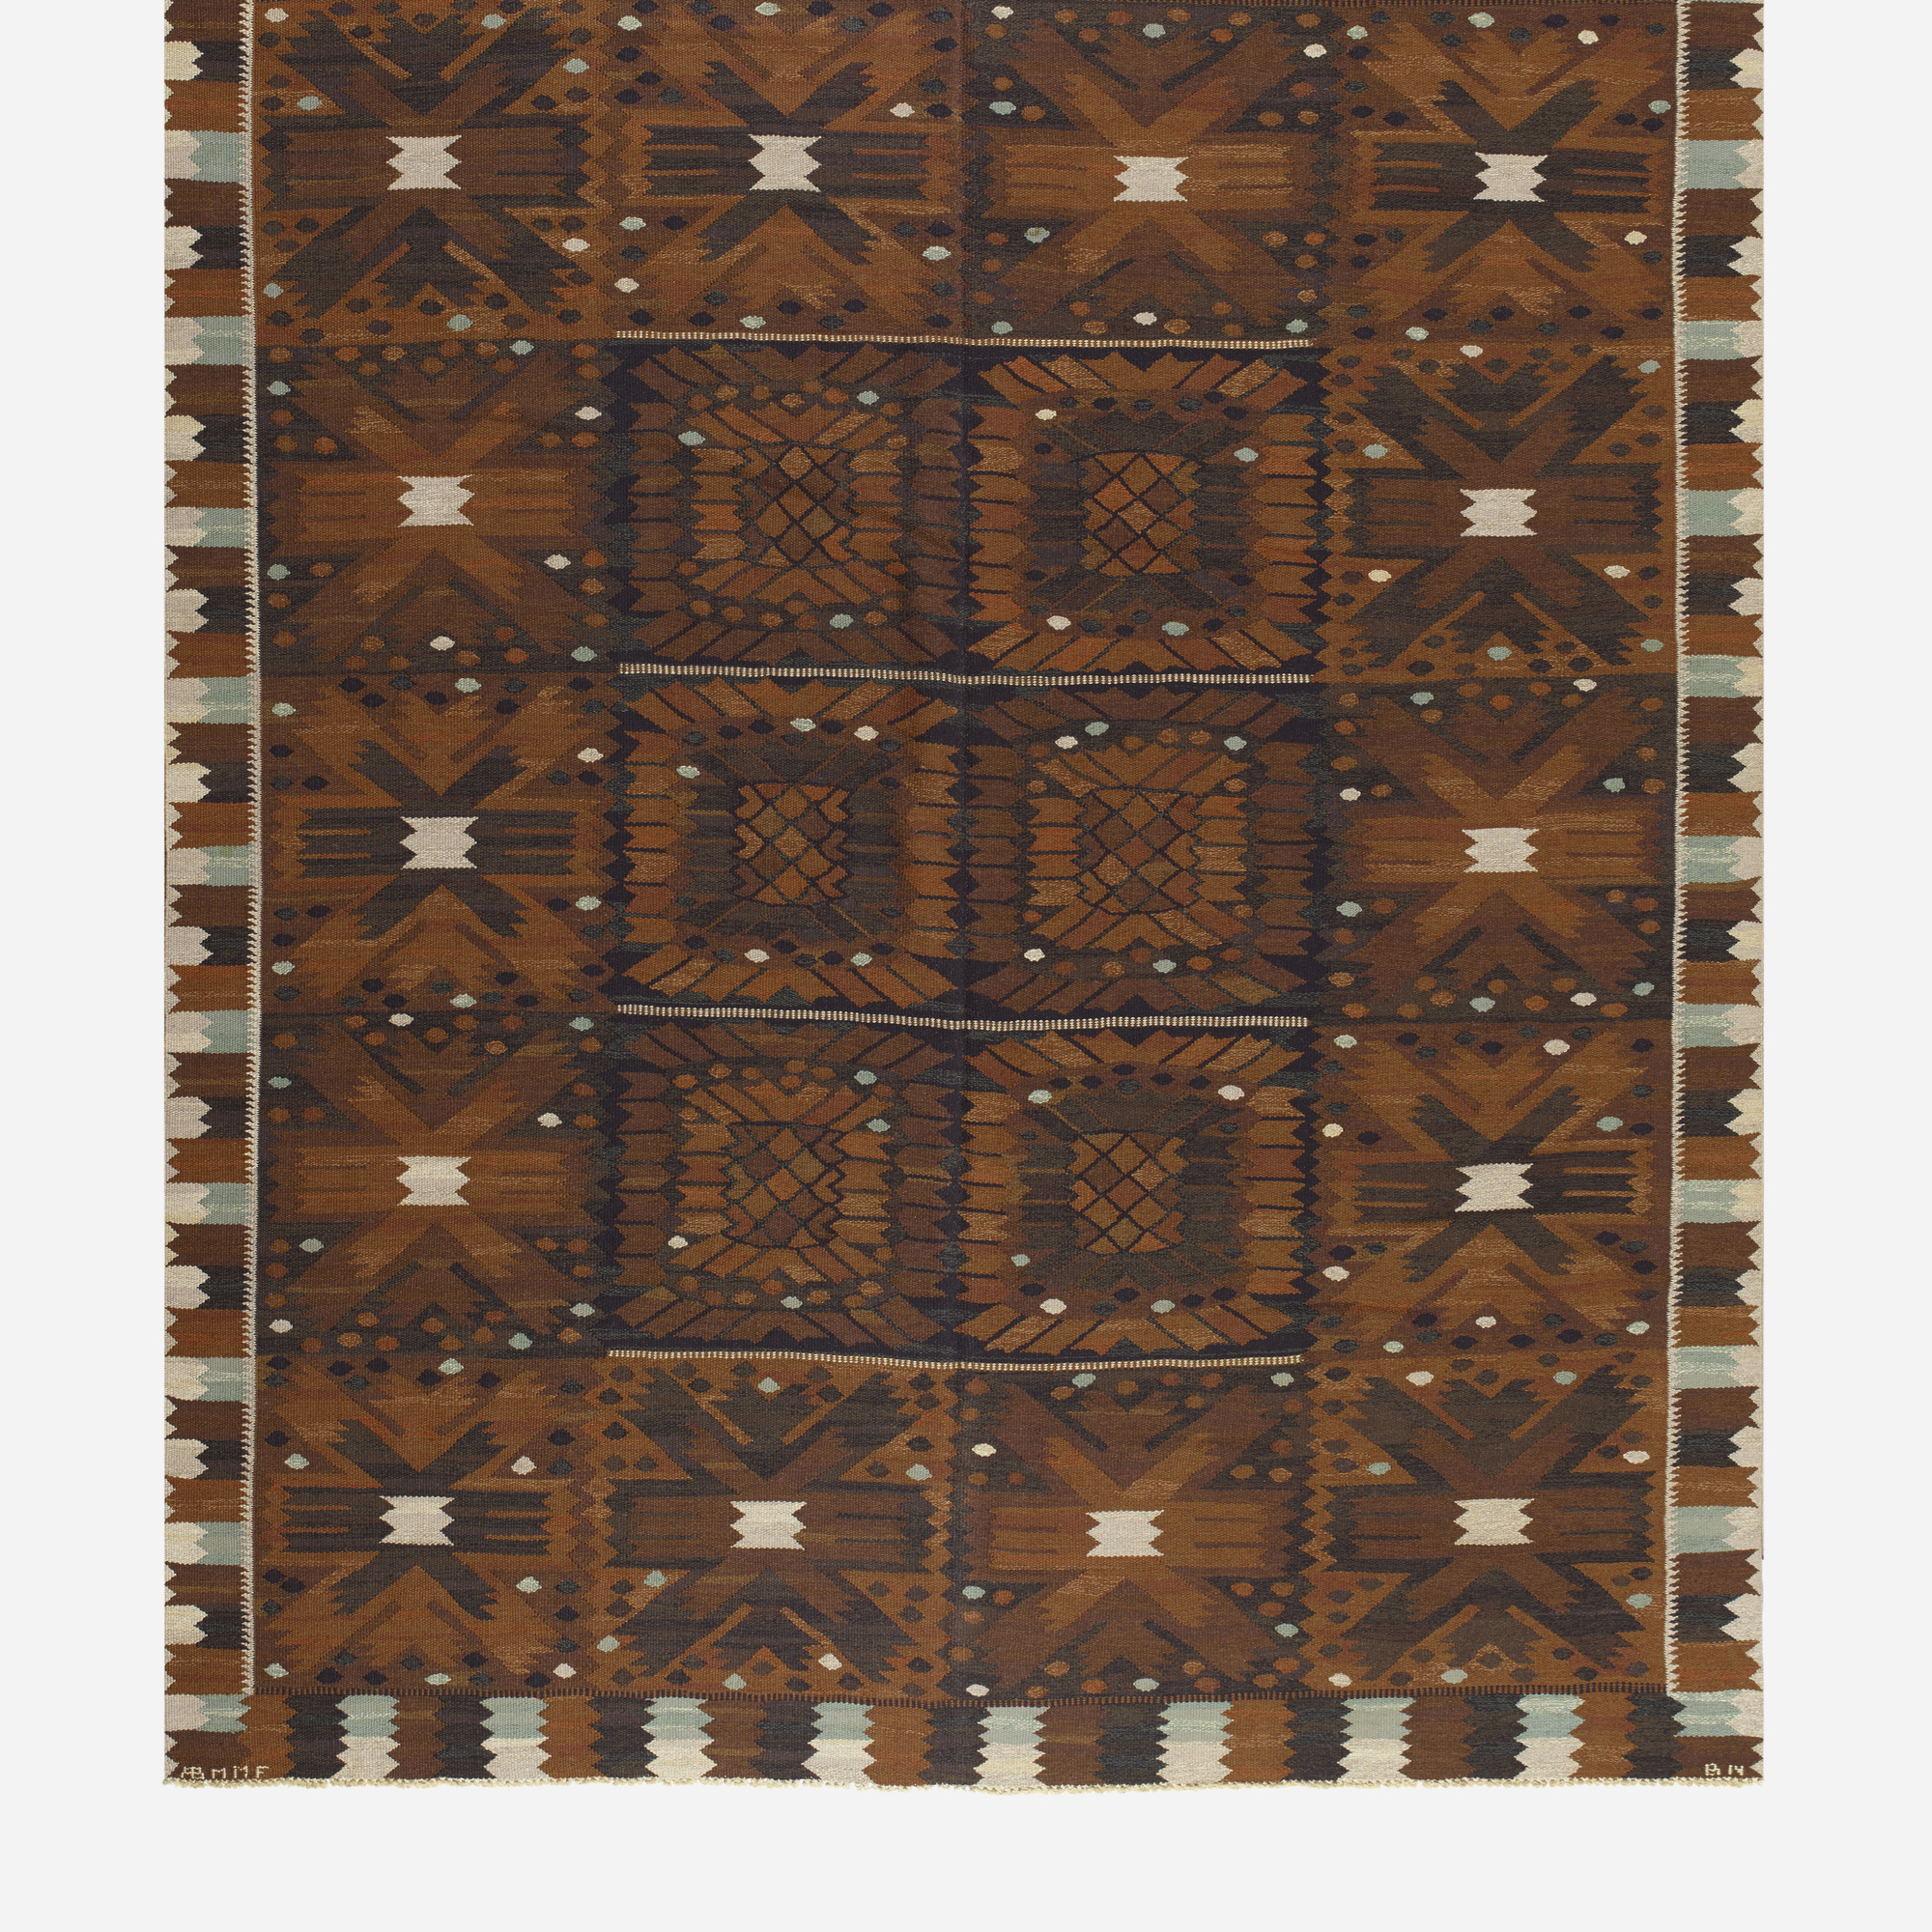 147: Barbro Nilsson / Carnation tapestry weave carpet (2 of 2)